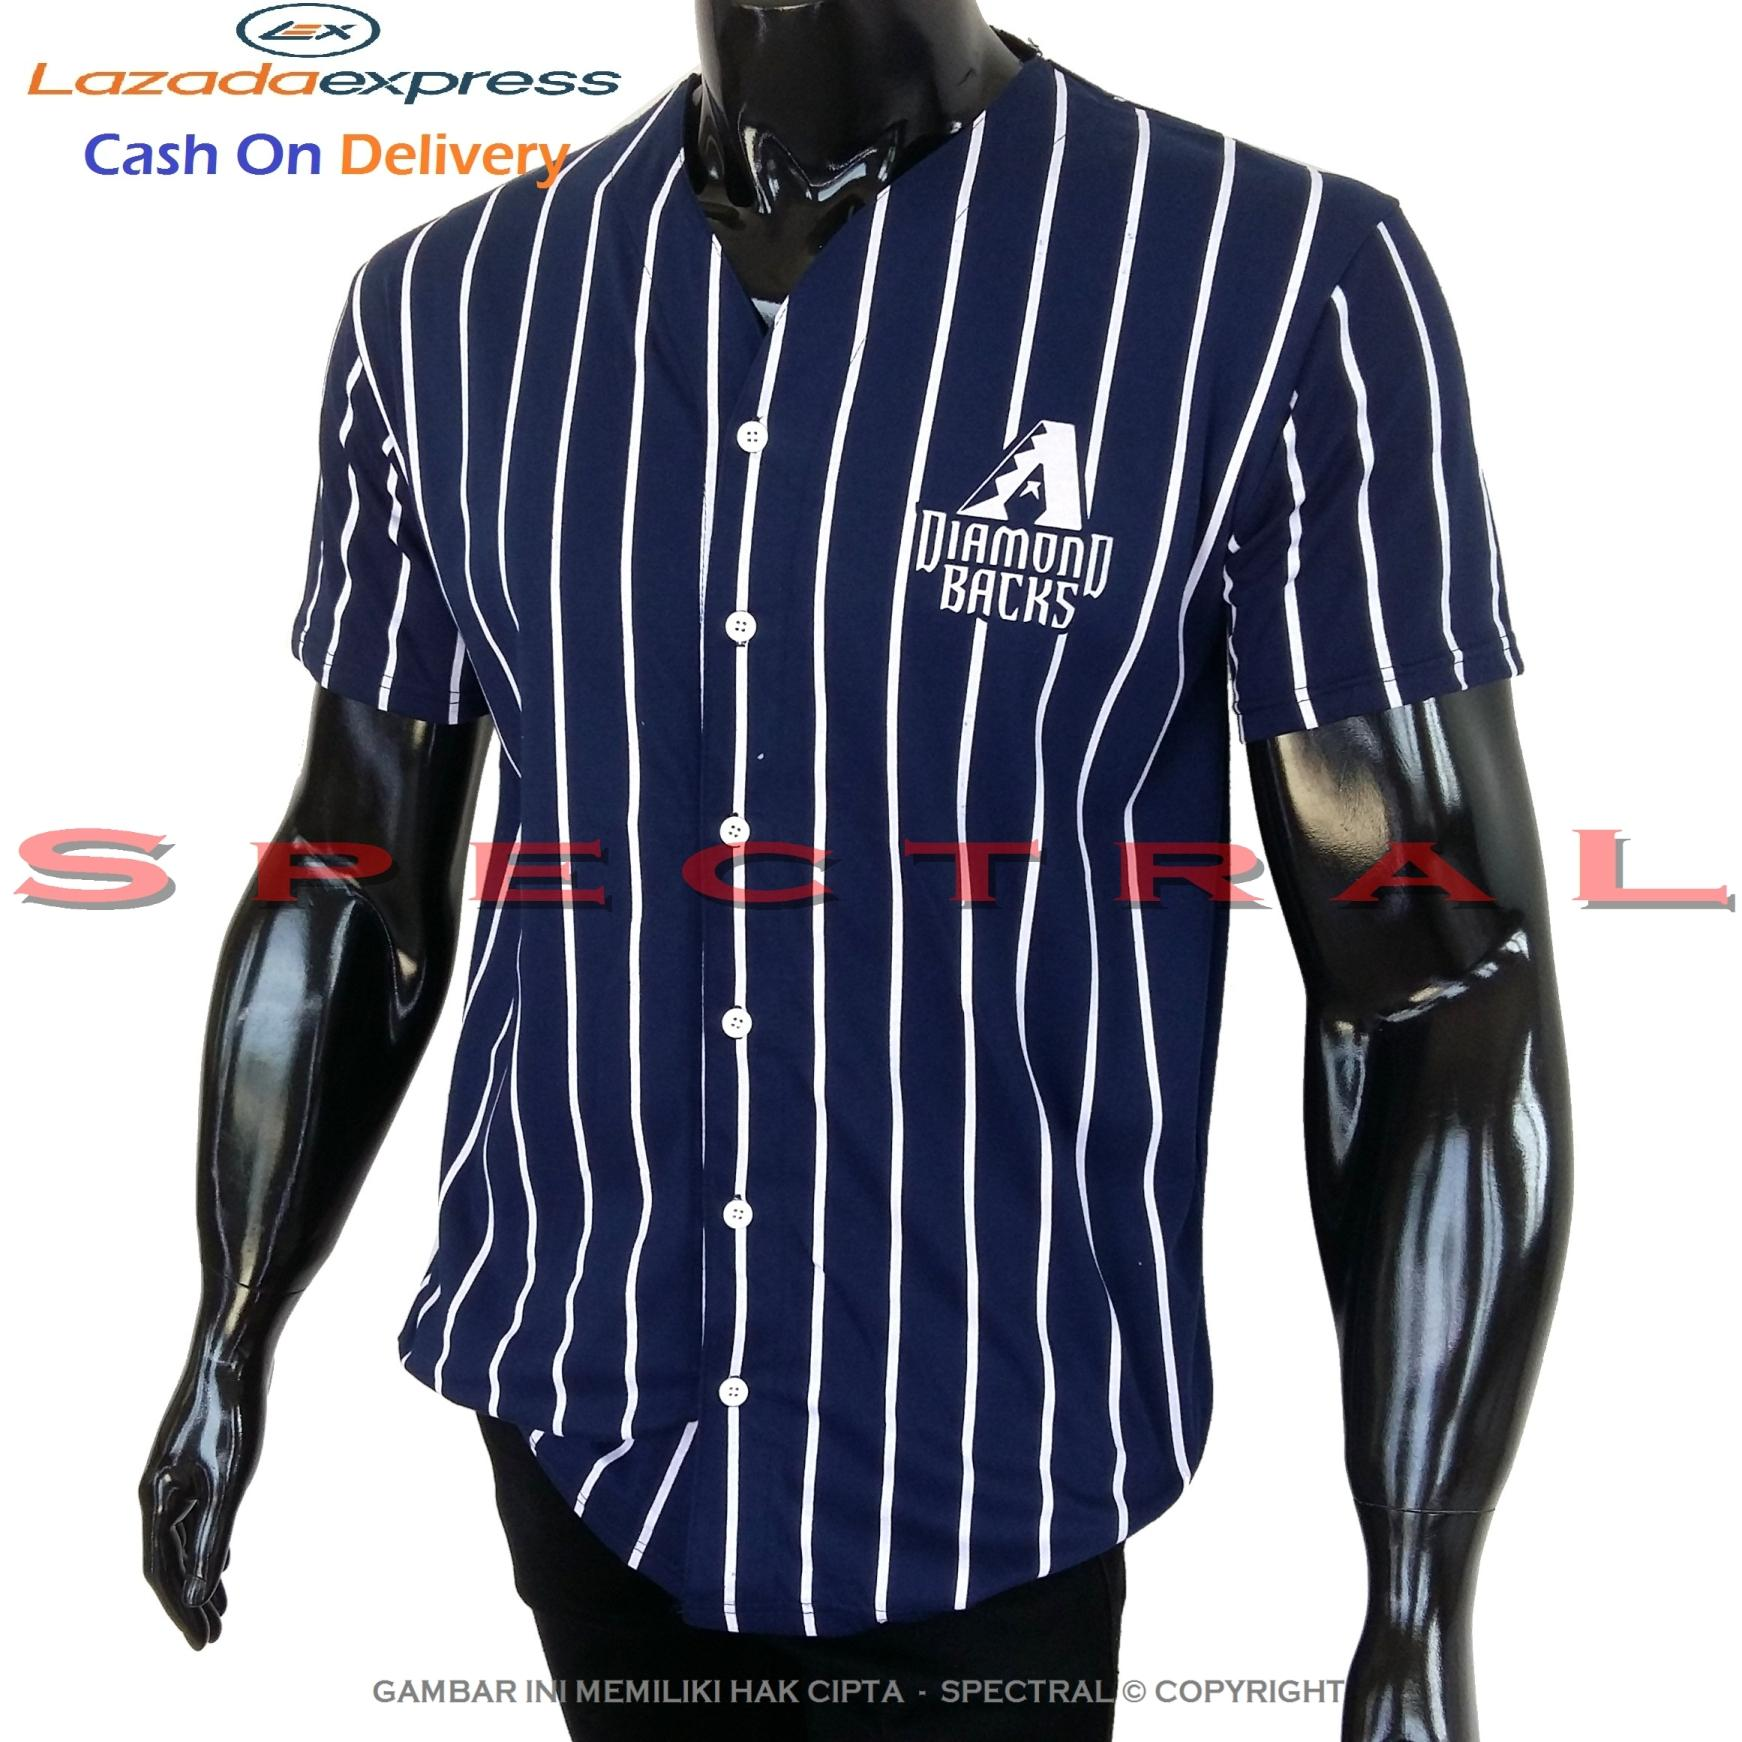 Spectral – Kemeja Distro L / XL Kaos Cotton Combed Baseball Basket Rap Hip Hiphop Sport Olahraga Atasan Casual Salur Pakaian Fashion Baju Shirt T-Shirt Keren Bagus Murah Pria Wanita Cewe Cowo Hitam Putih Formal Casual Jaman Now Kekinian